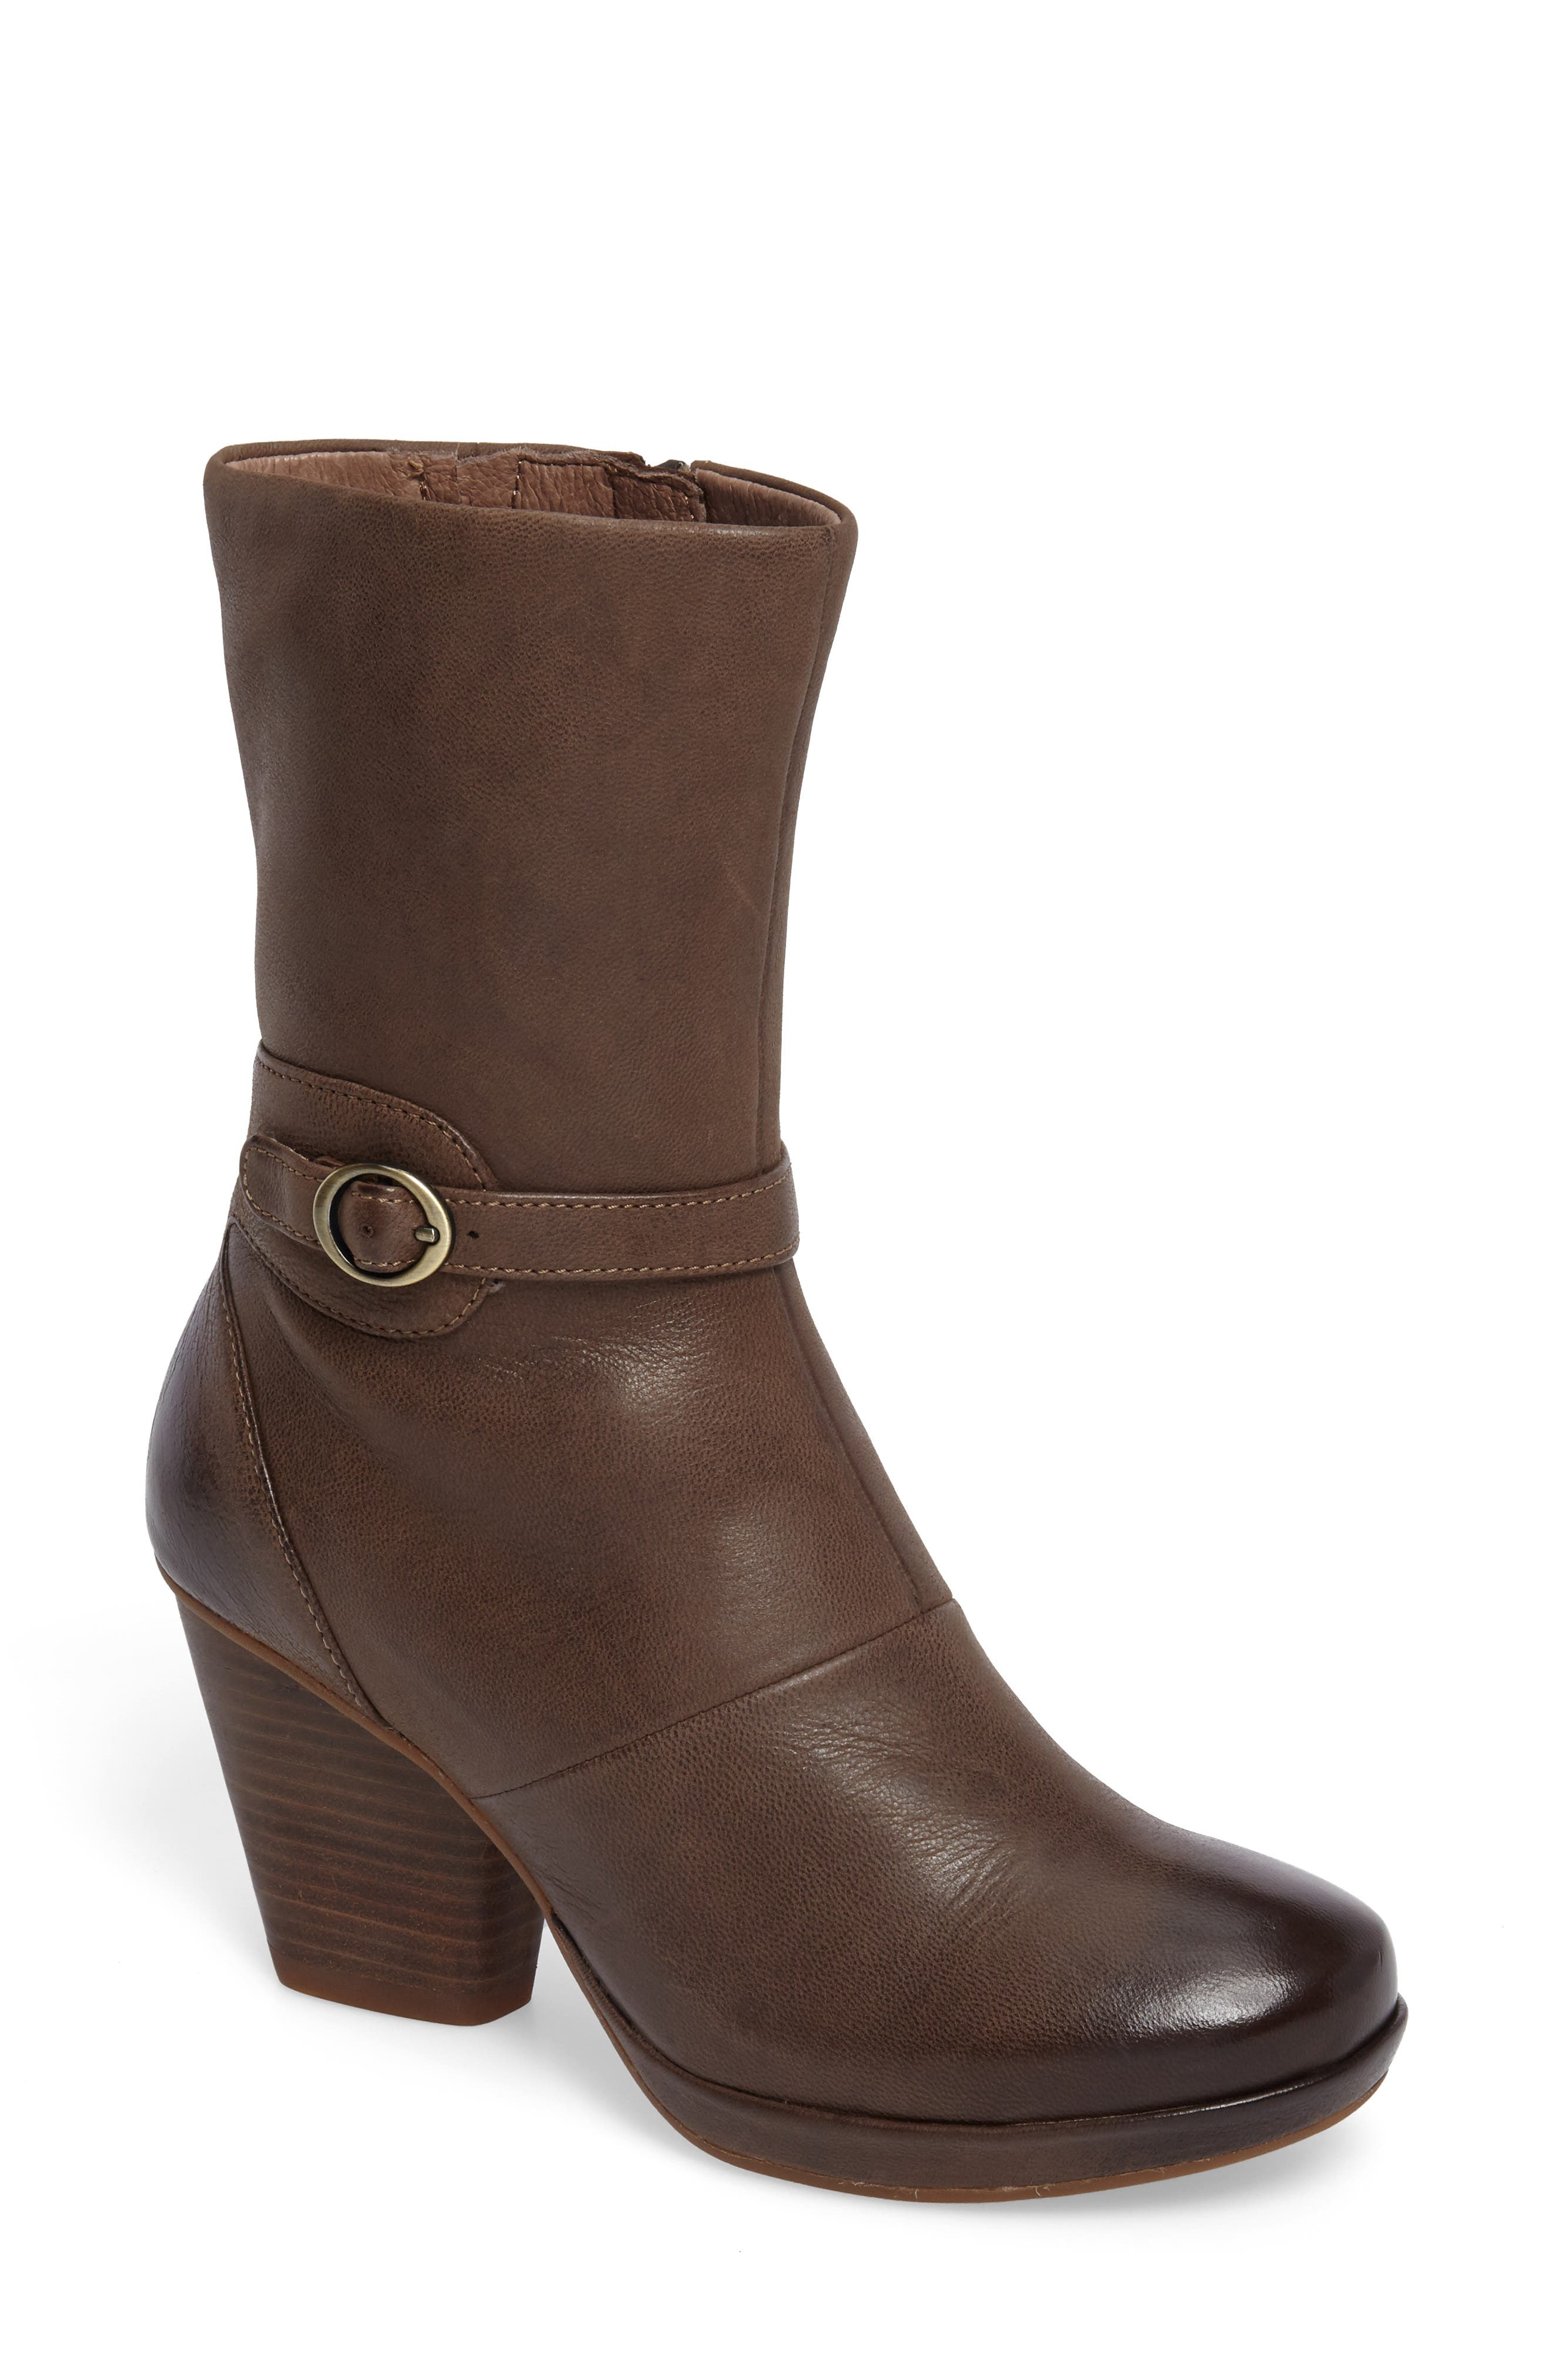 Alternate Image 1 Selected - Dansko Marietta Boot (Women)